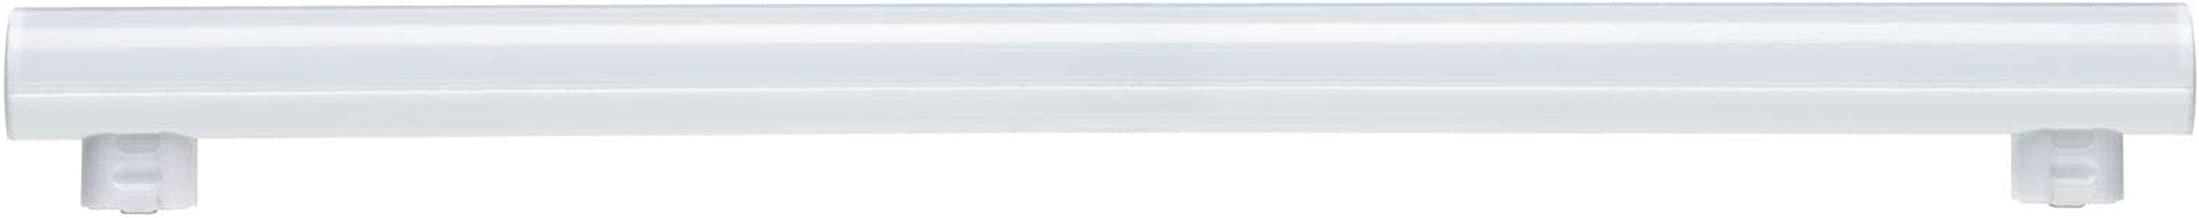 Paulmann 28304 LED Linear 6.5 watts Special lamp S14s 500 mm 230V 2,700K Warm White 500 lumens, W, Opal